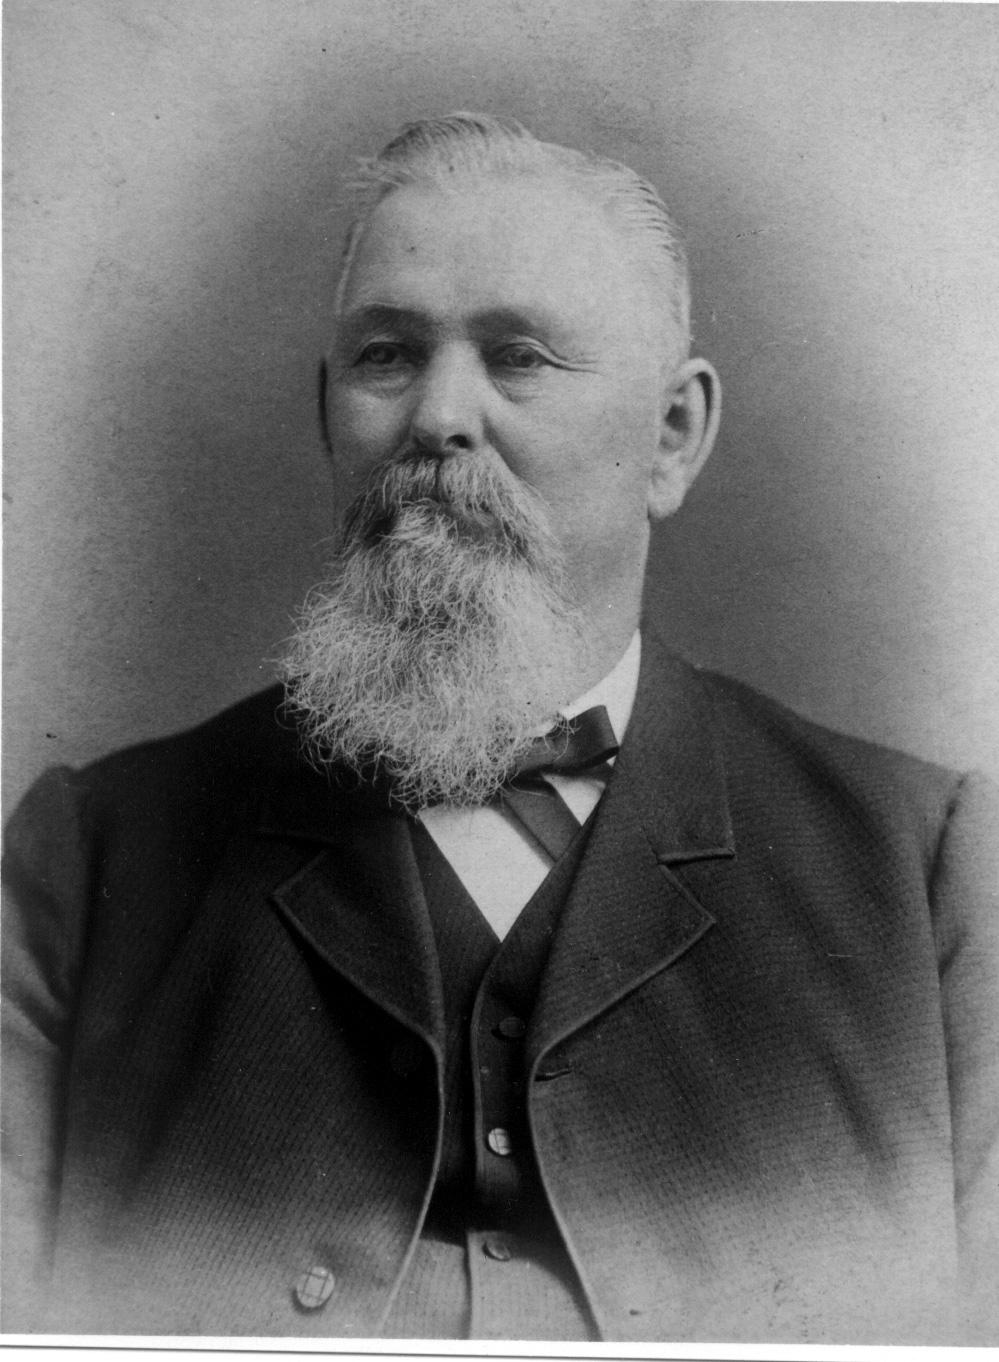 James Perkins